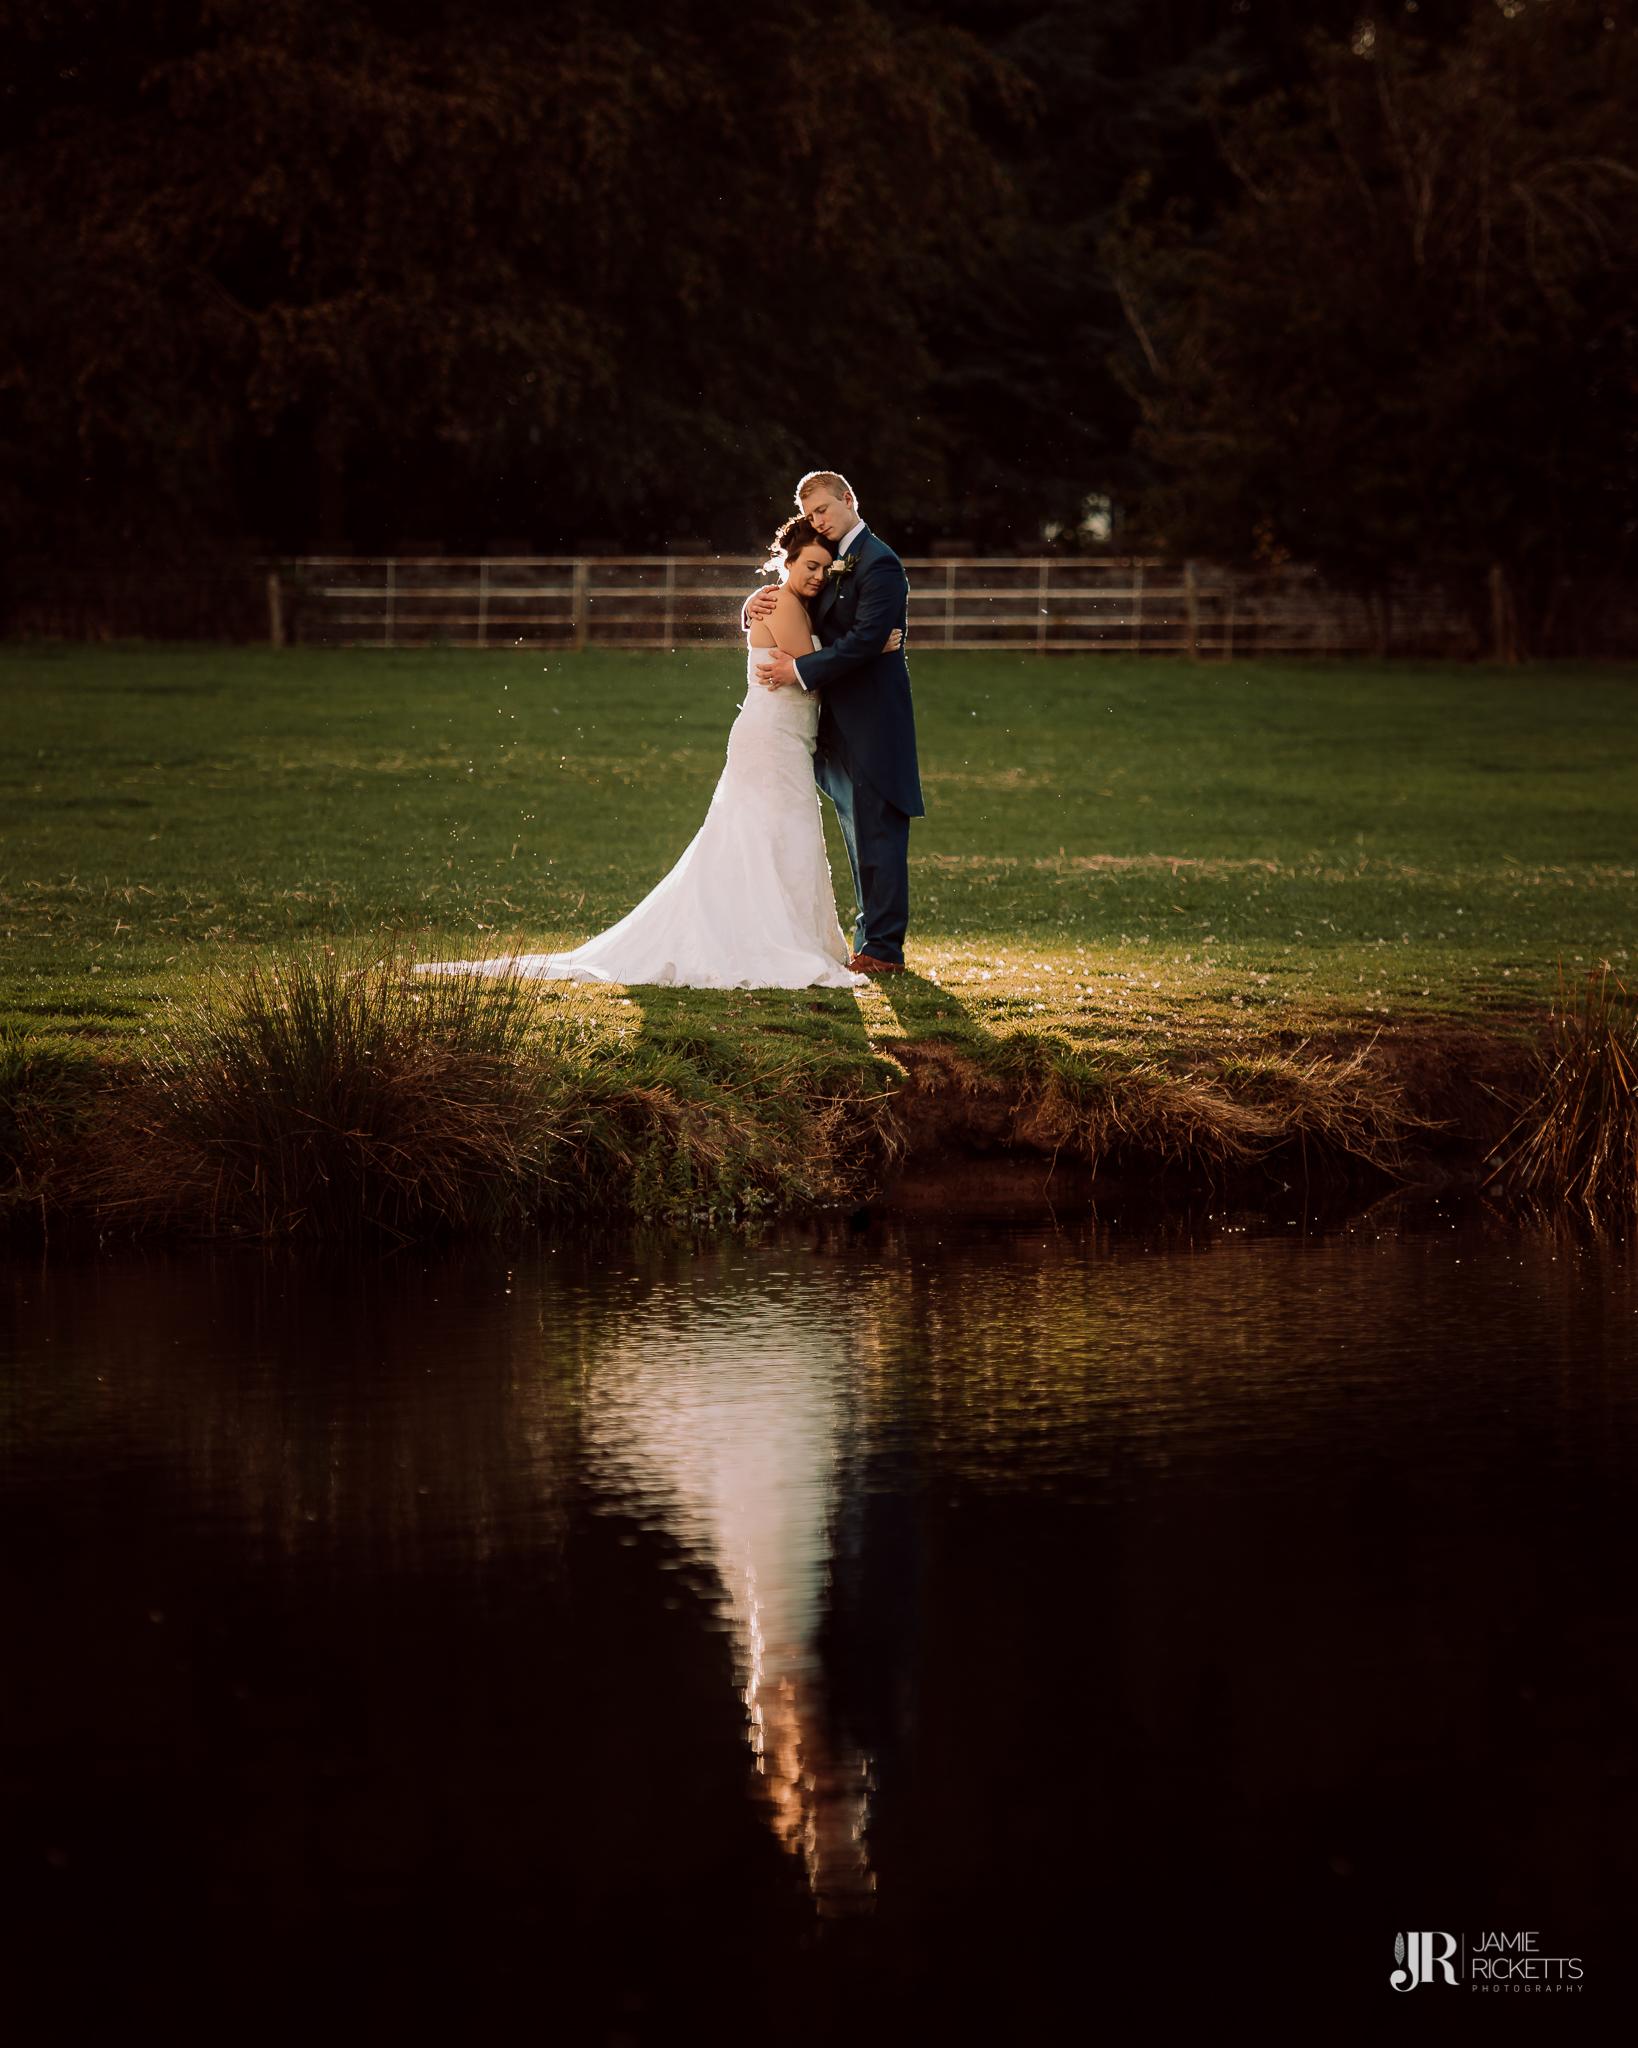 Wedding-Photographer-Shropshire-22.JPG